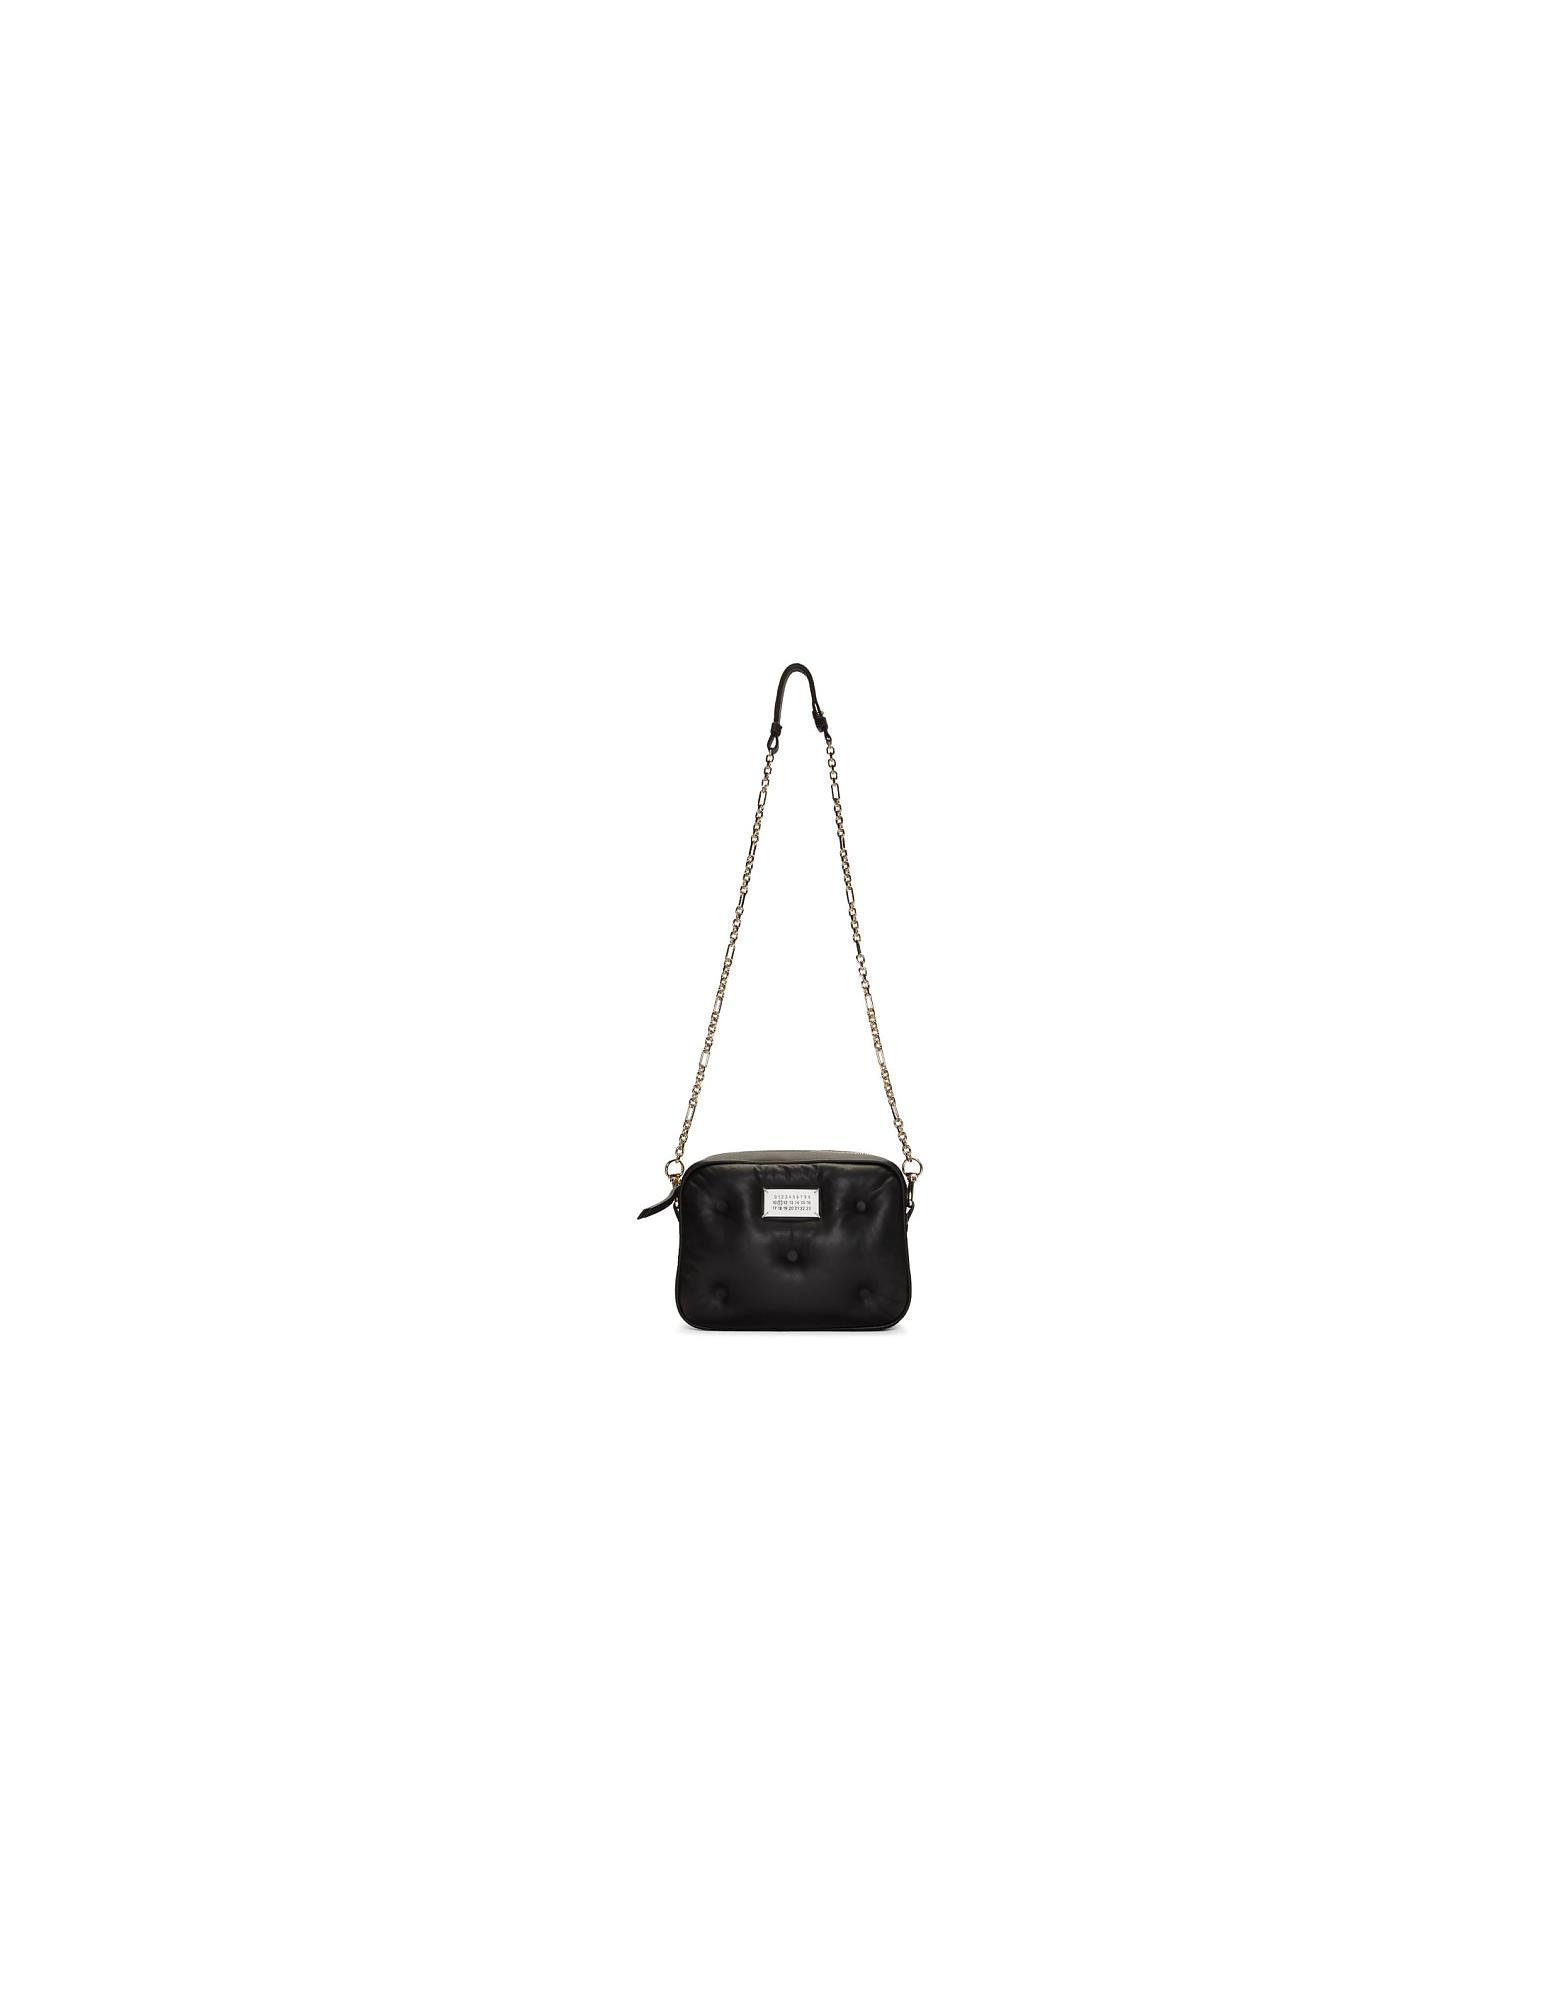 Maison Margiela Designer Handbags, Black Small Glam Slam Box Bag